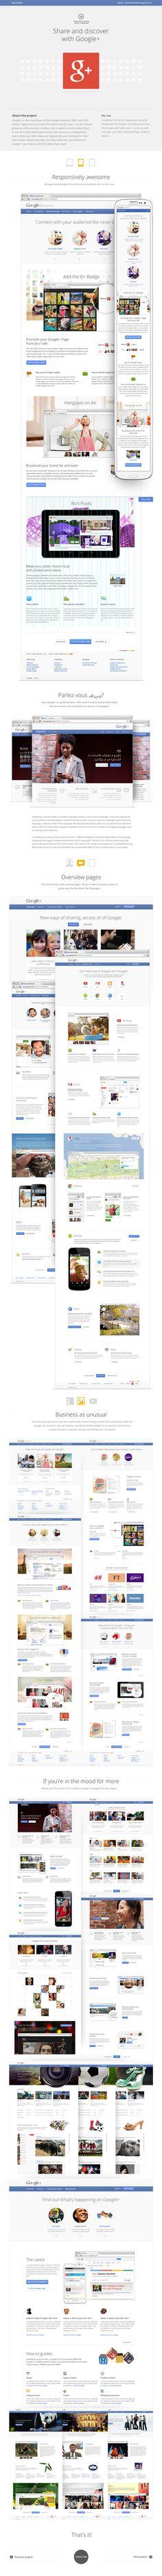 google+ redesign conception by Harald Urthorleifsson